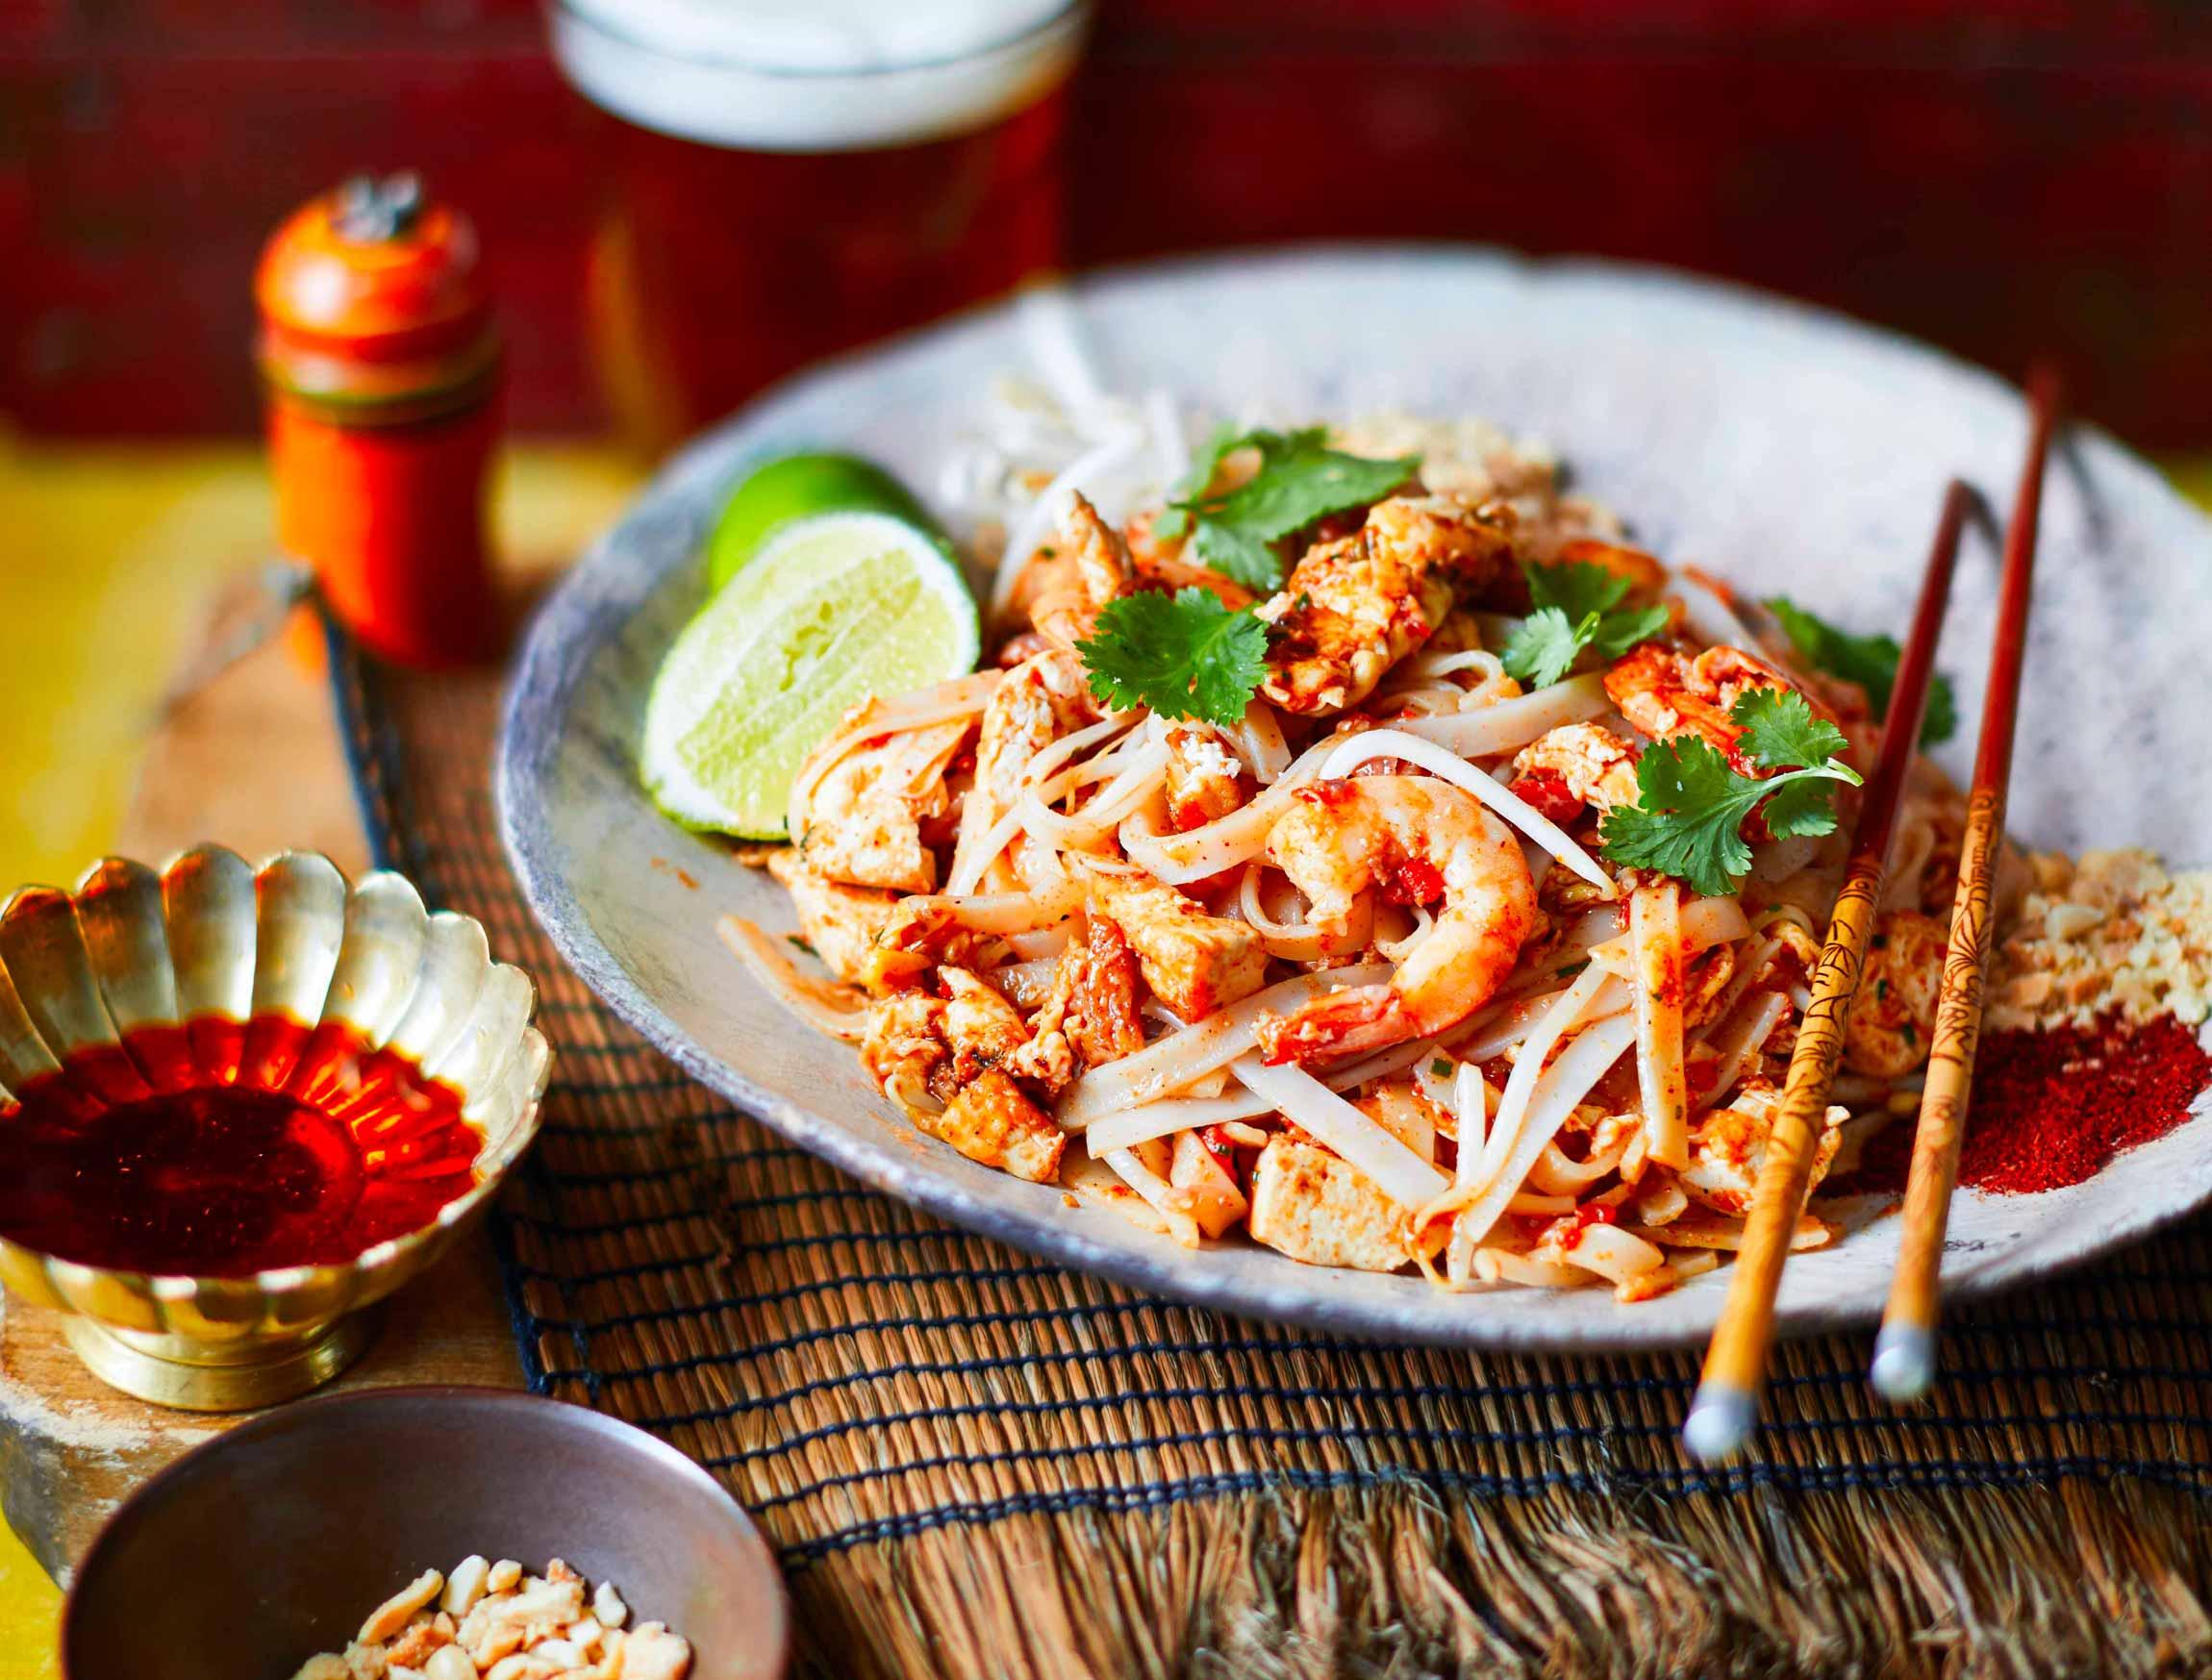 Farang-Crab-and-Shrimp-Pad-Thai-0059.jpg